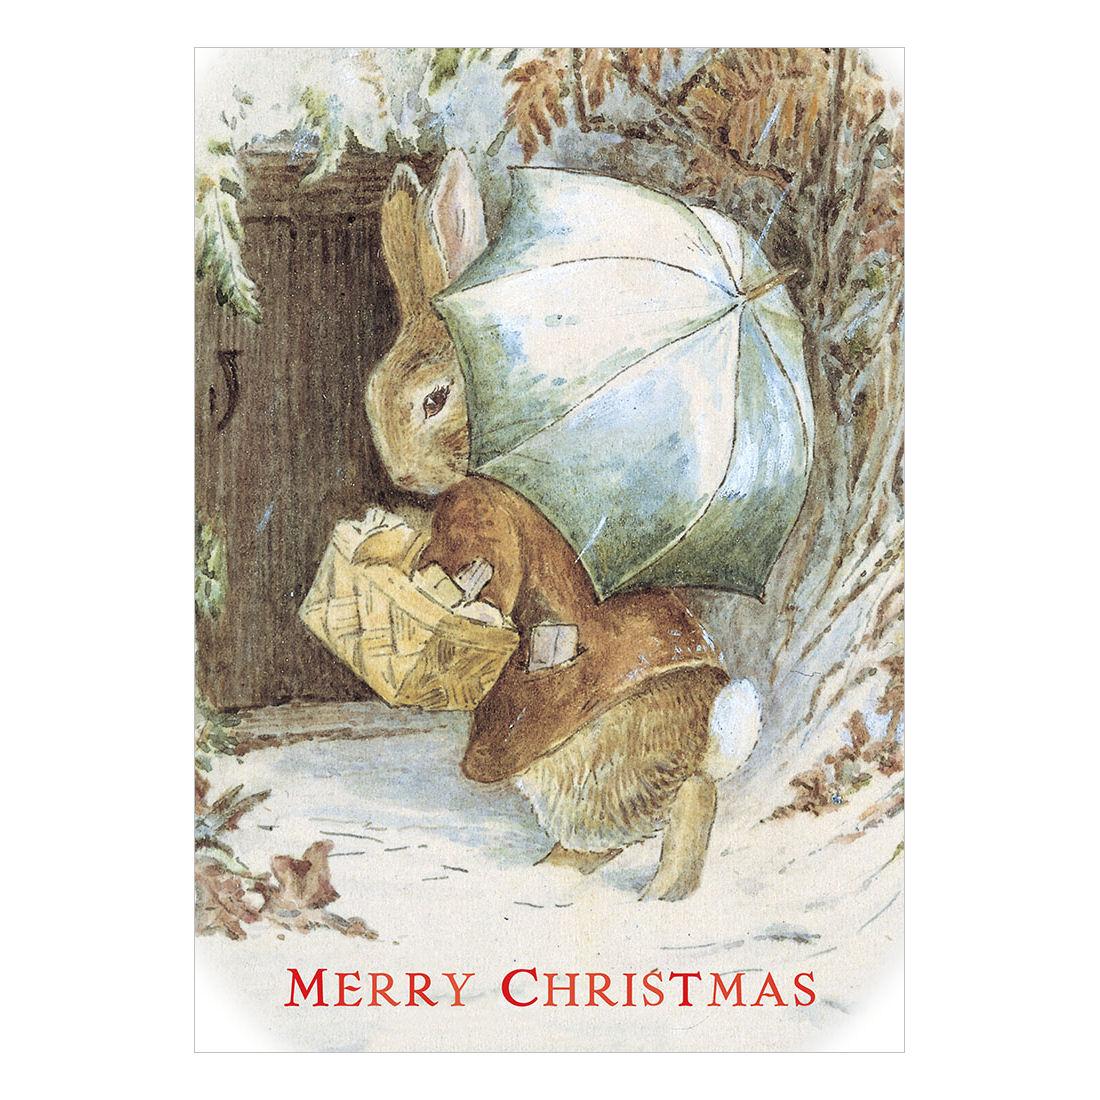 BENJAMIN BUNNY CHRISTMAS CARD RETRO VINTAGE BLANK GREETING